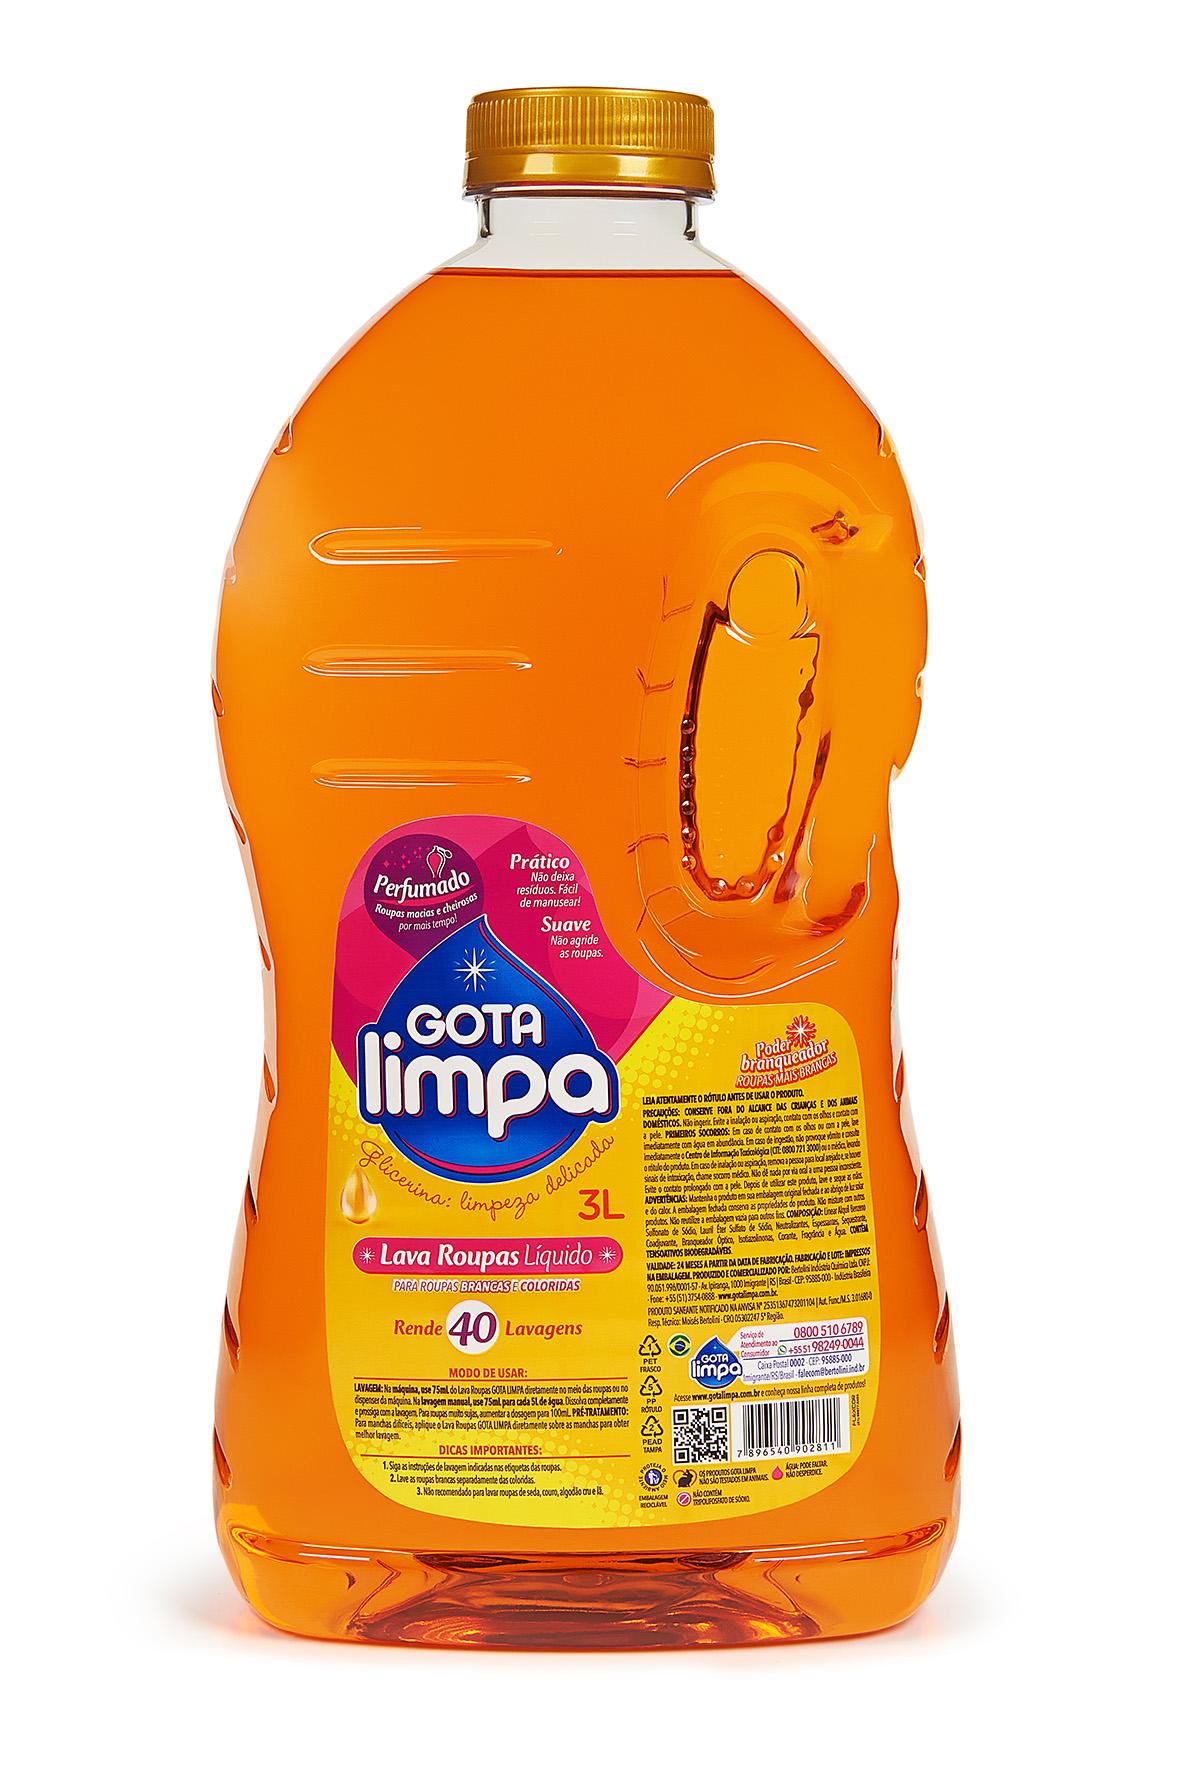 Lava Roupas Gota Limpa Glicerina 3L